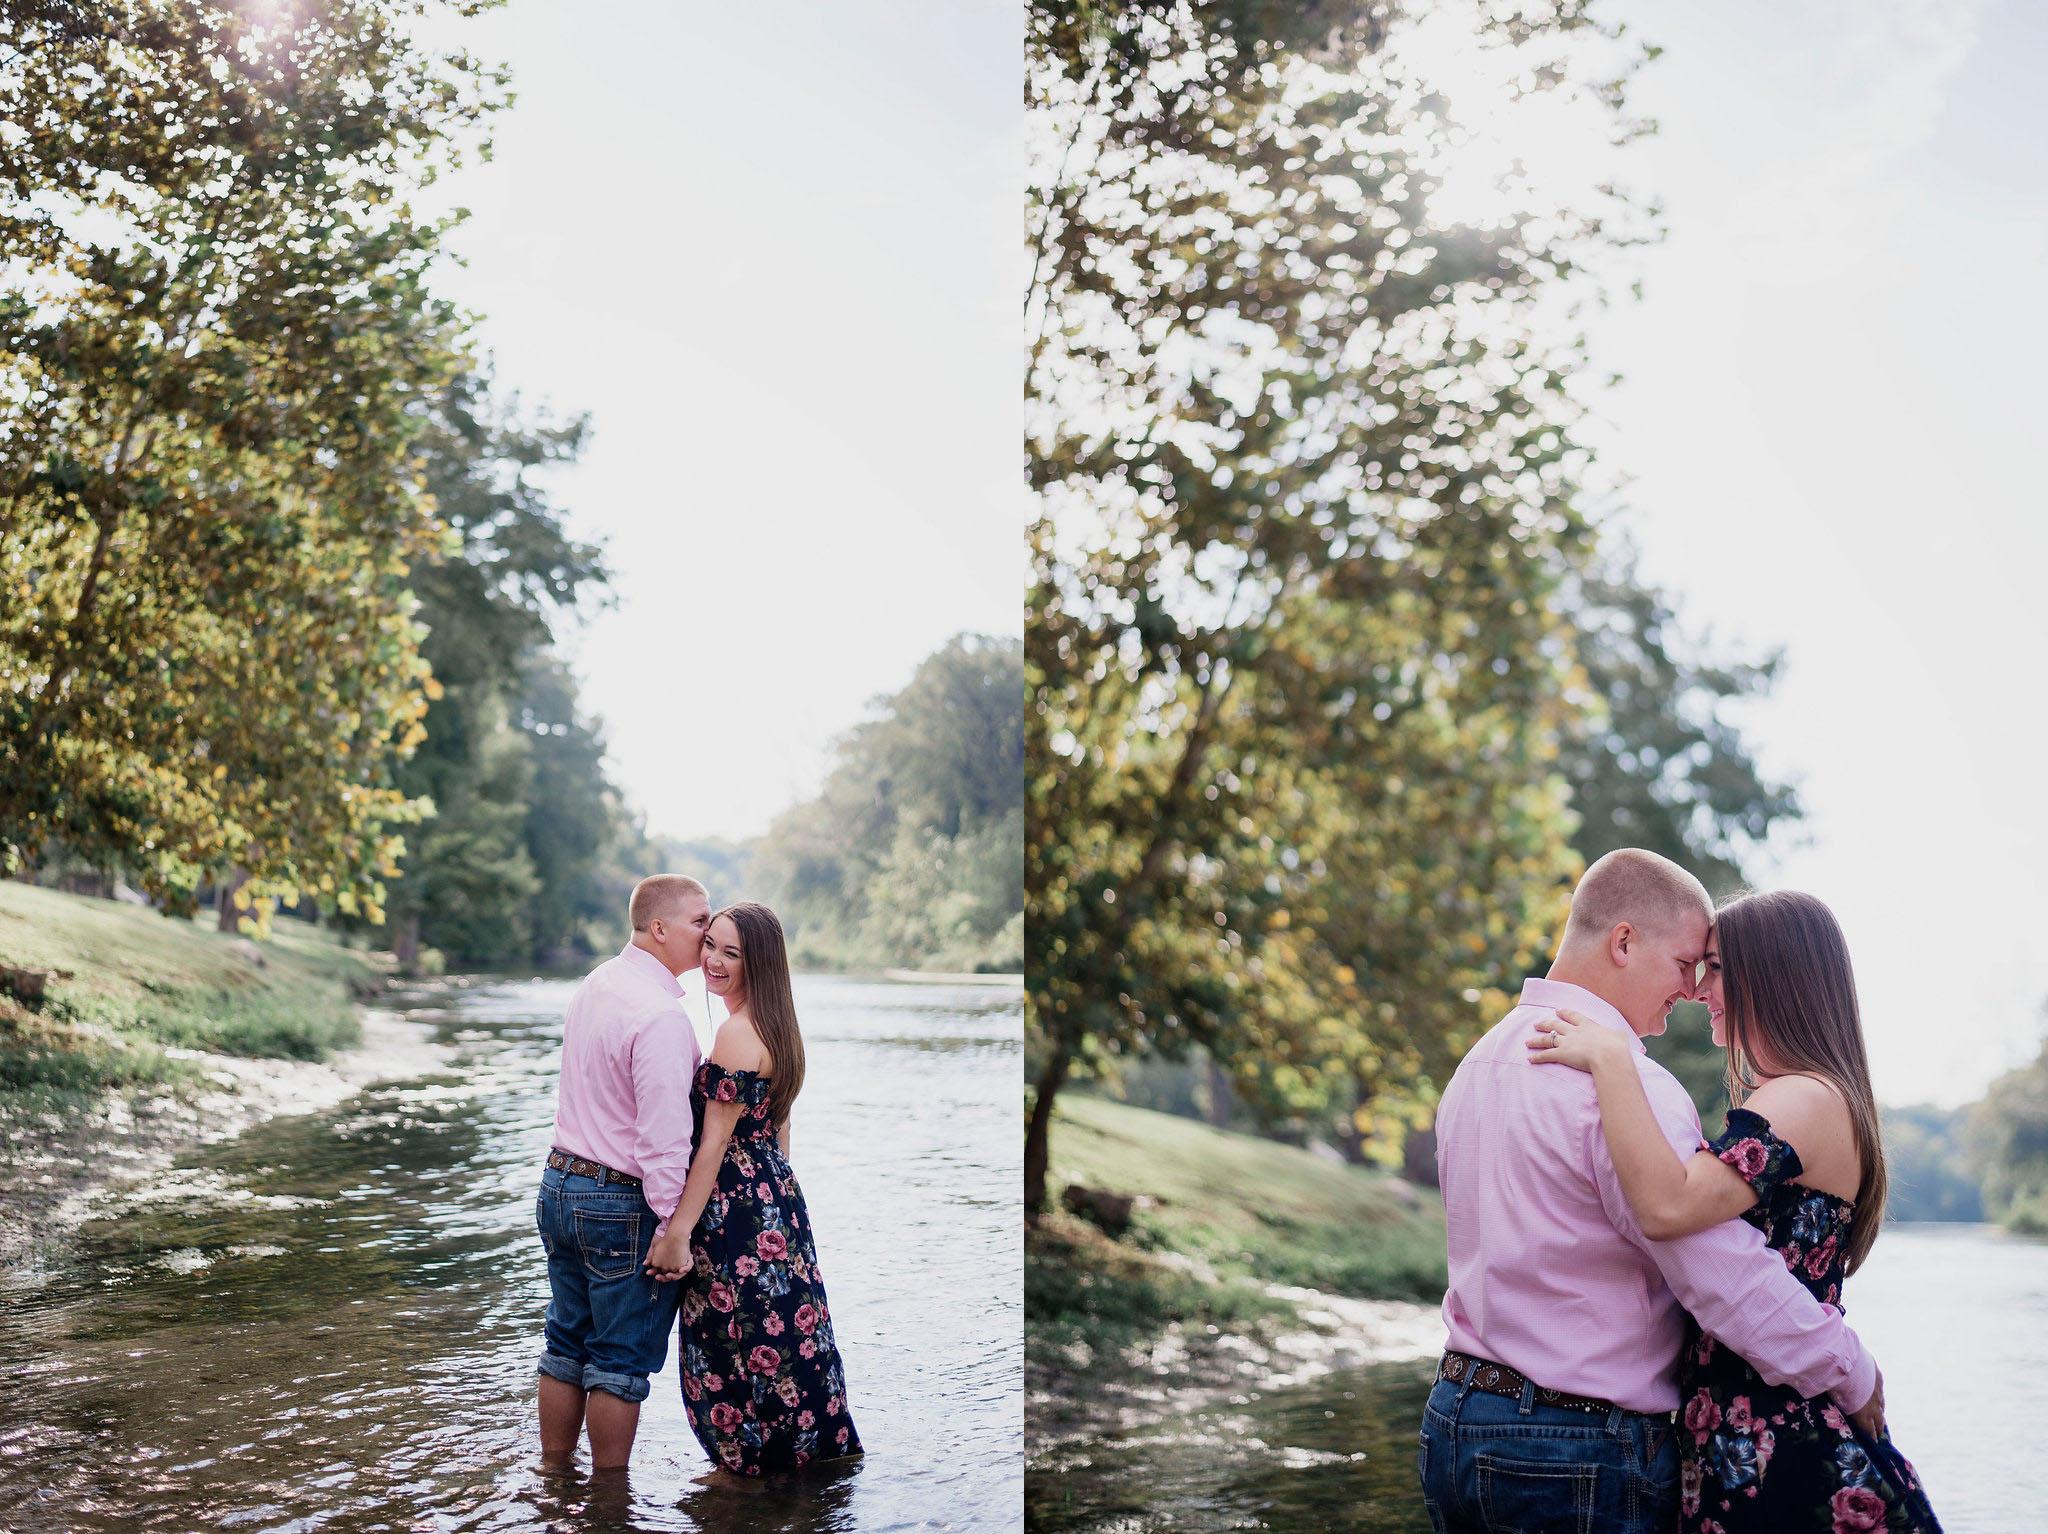 EffJay Photography Gruene TX Engagement Session Destination Wedding Photographer025 copy.jpg